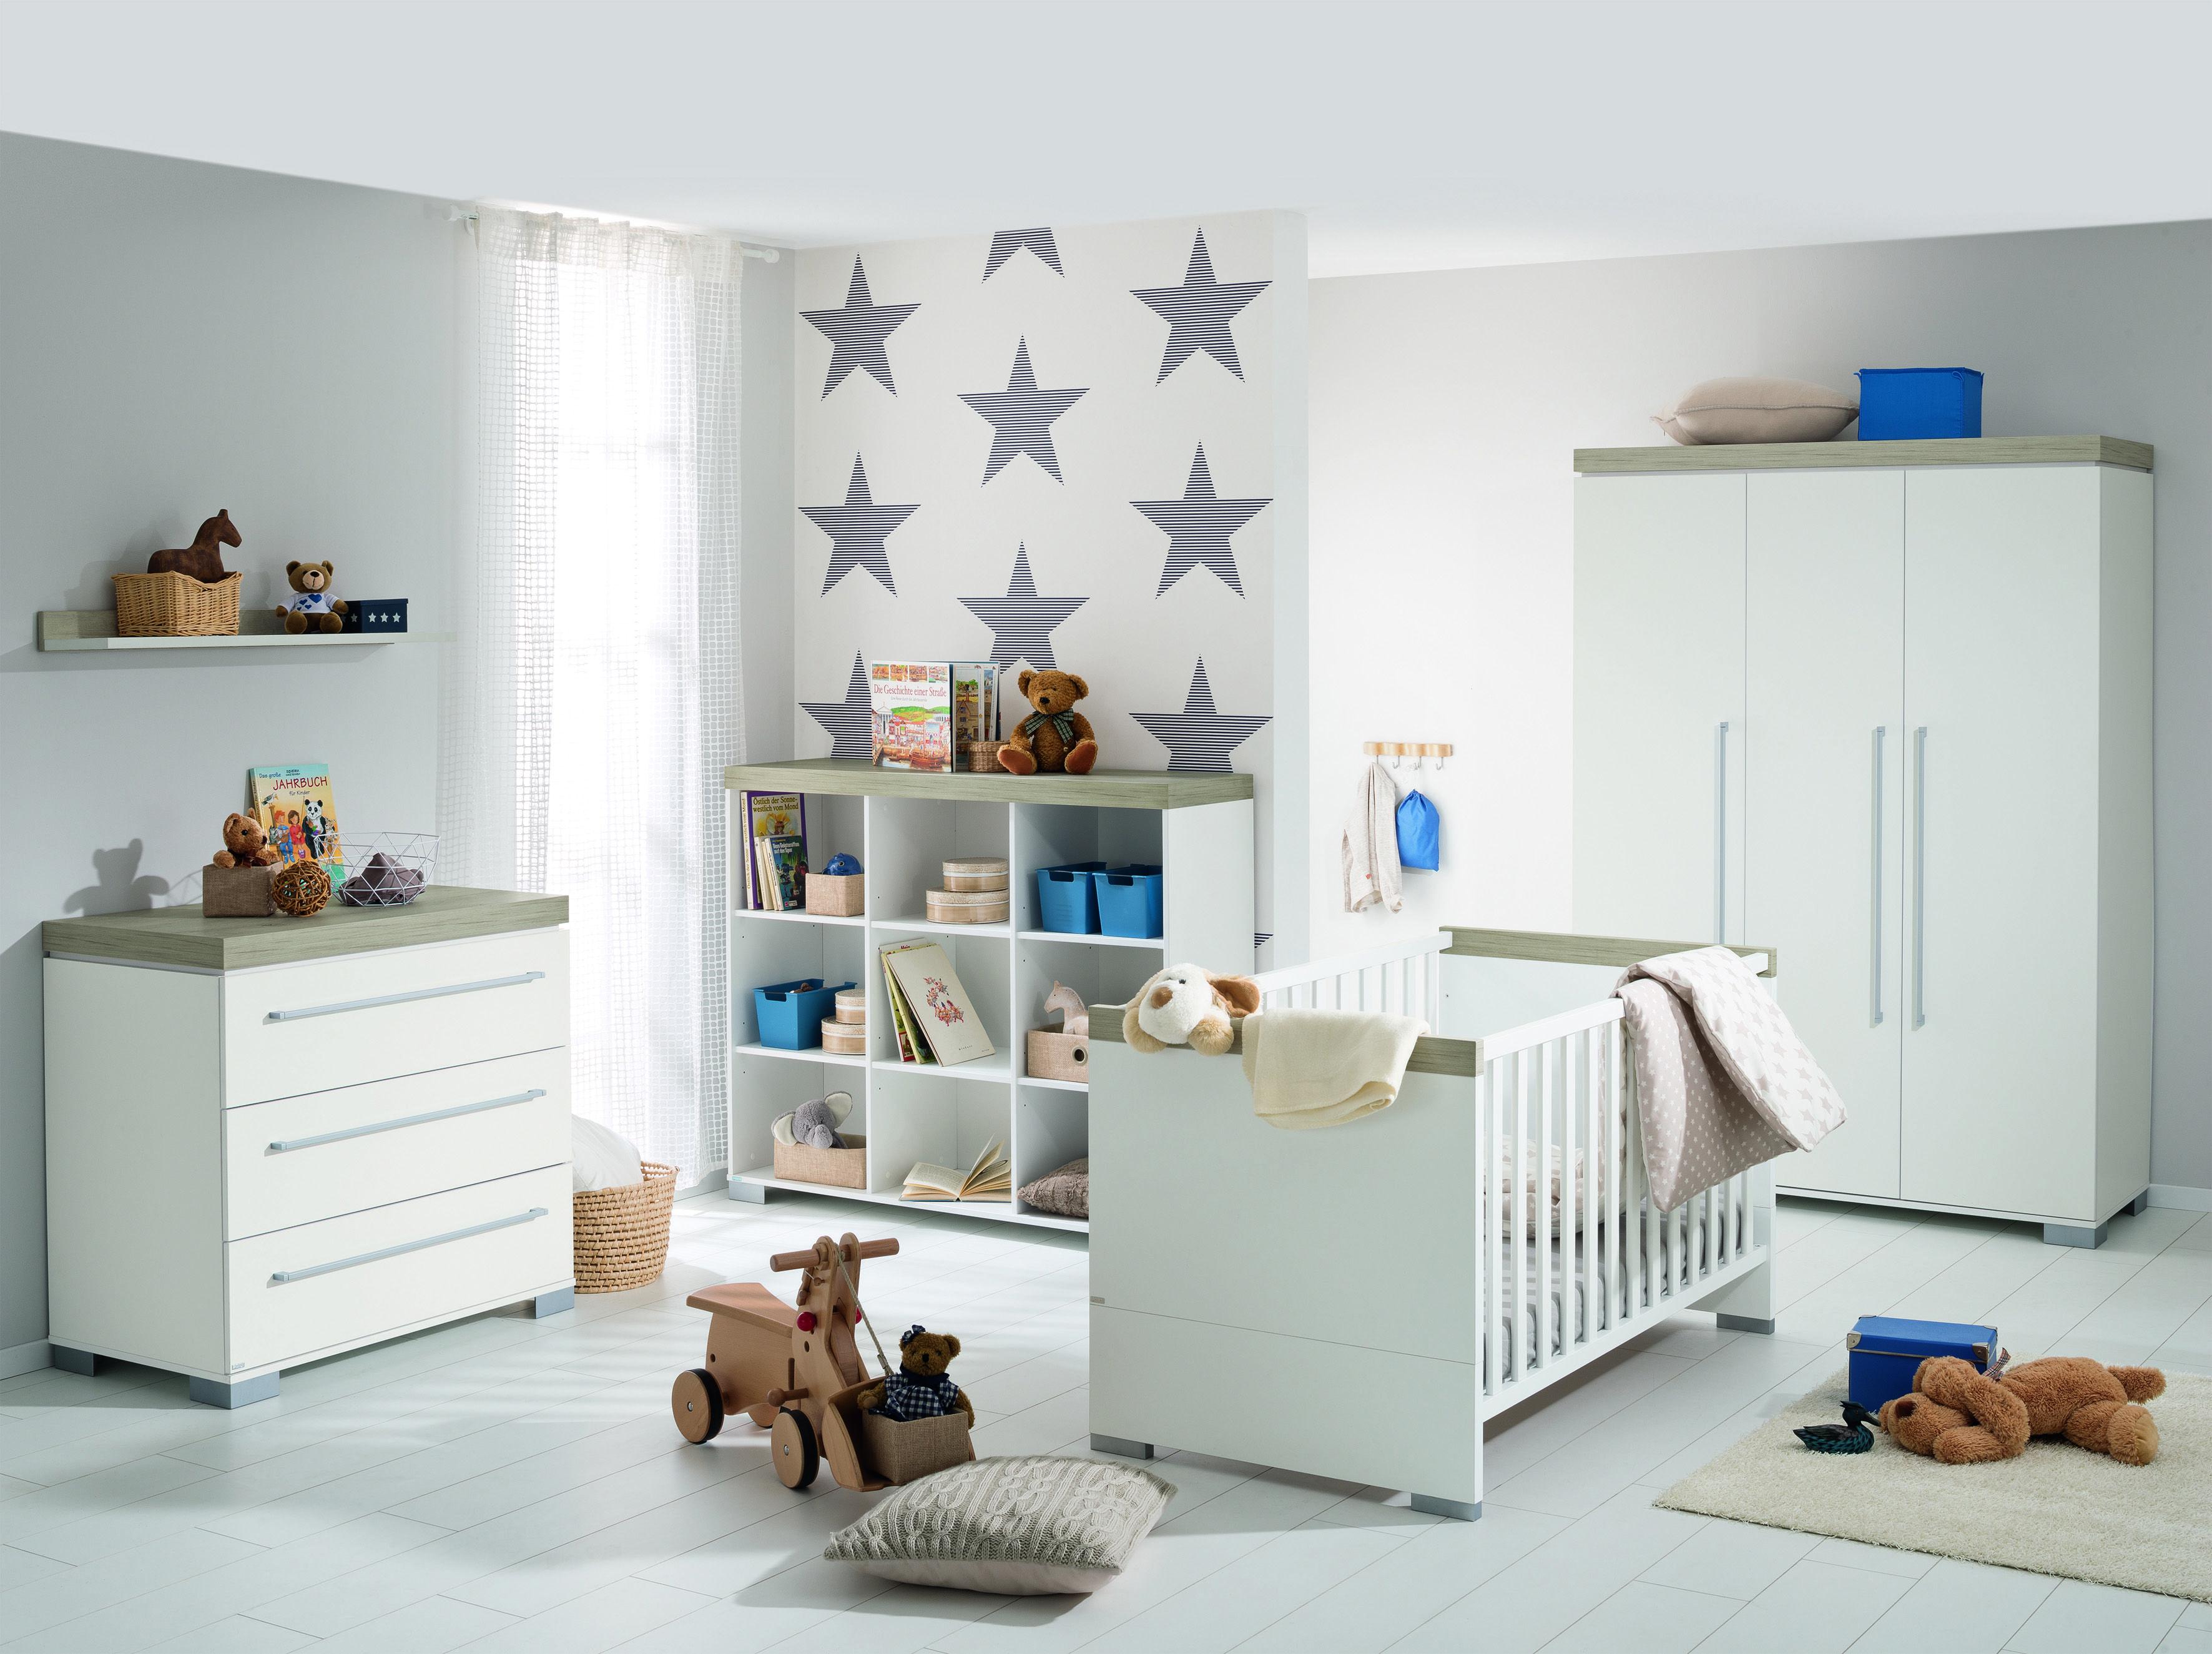 Kinderzimmer Alessia ~ Kinderzimmer alessia am besten büro stühle home dekoration tipps